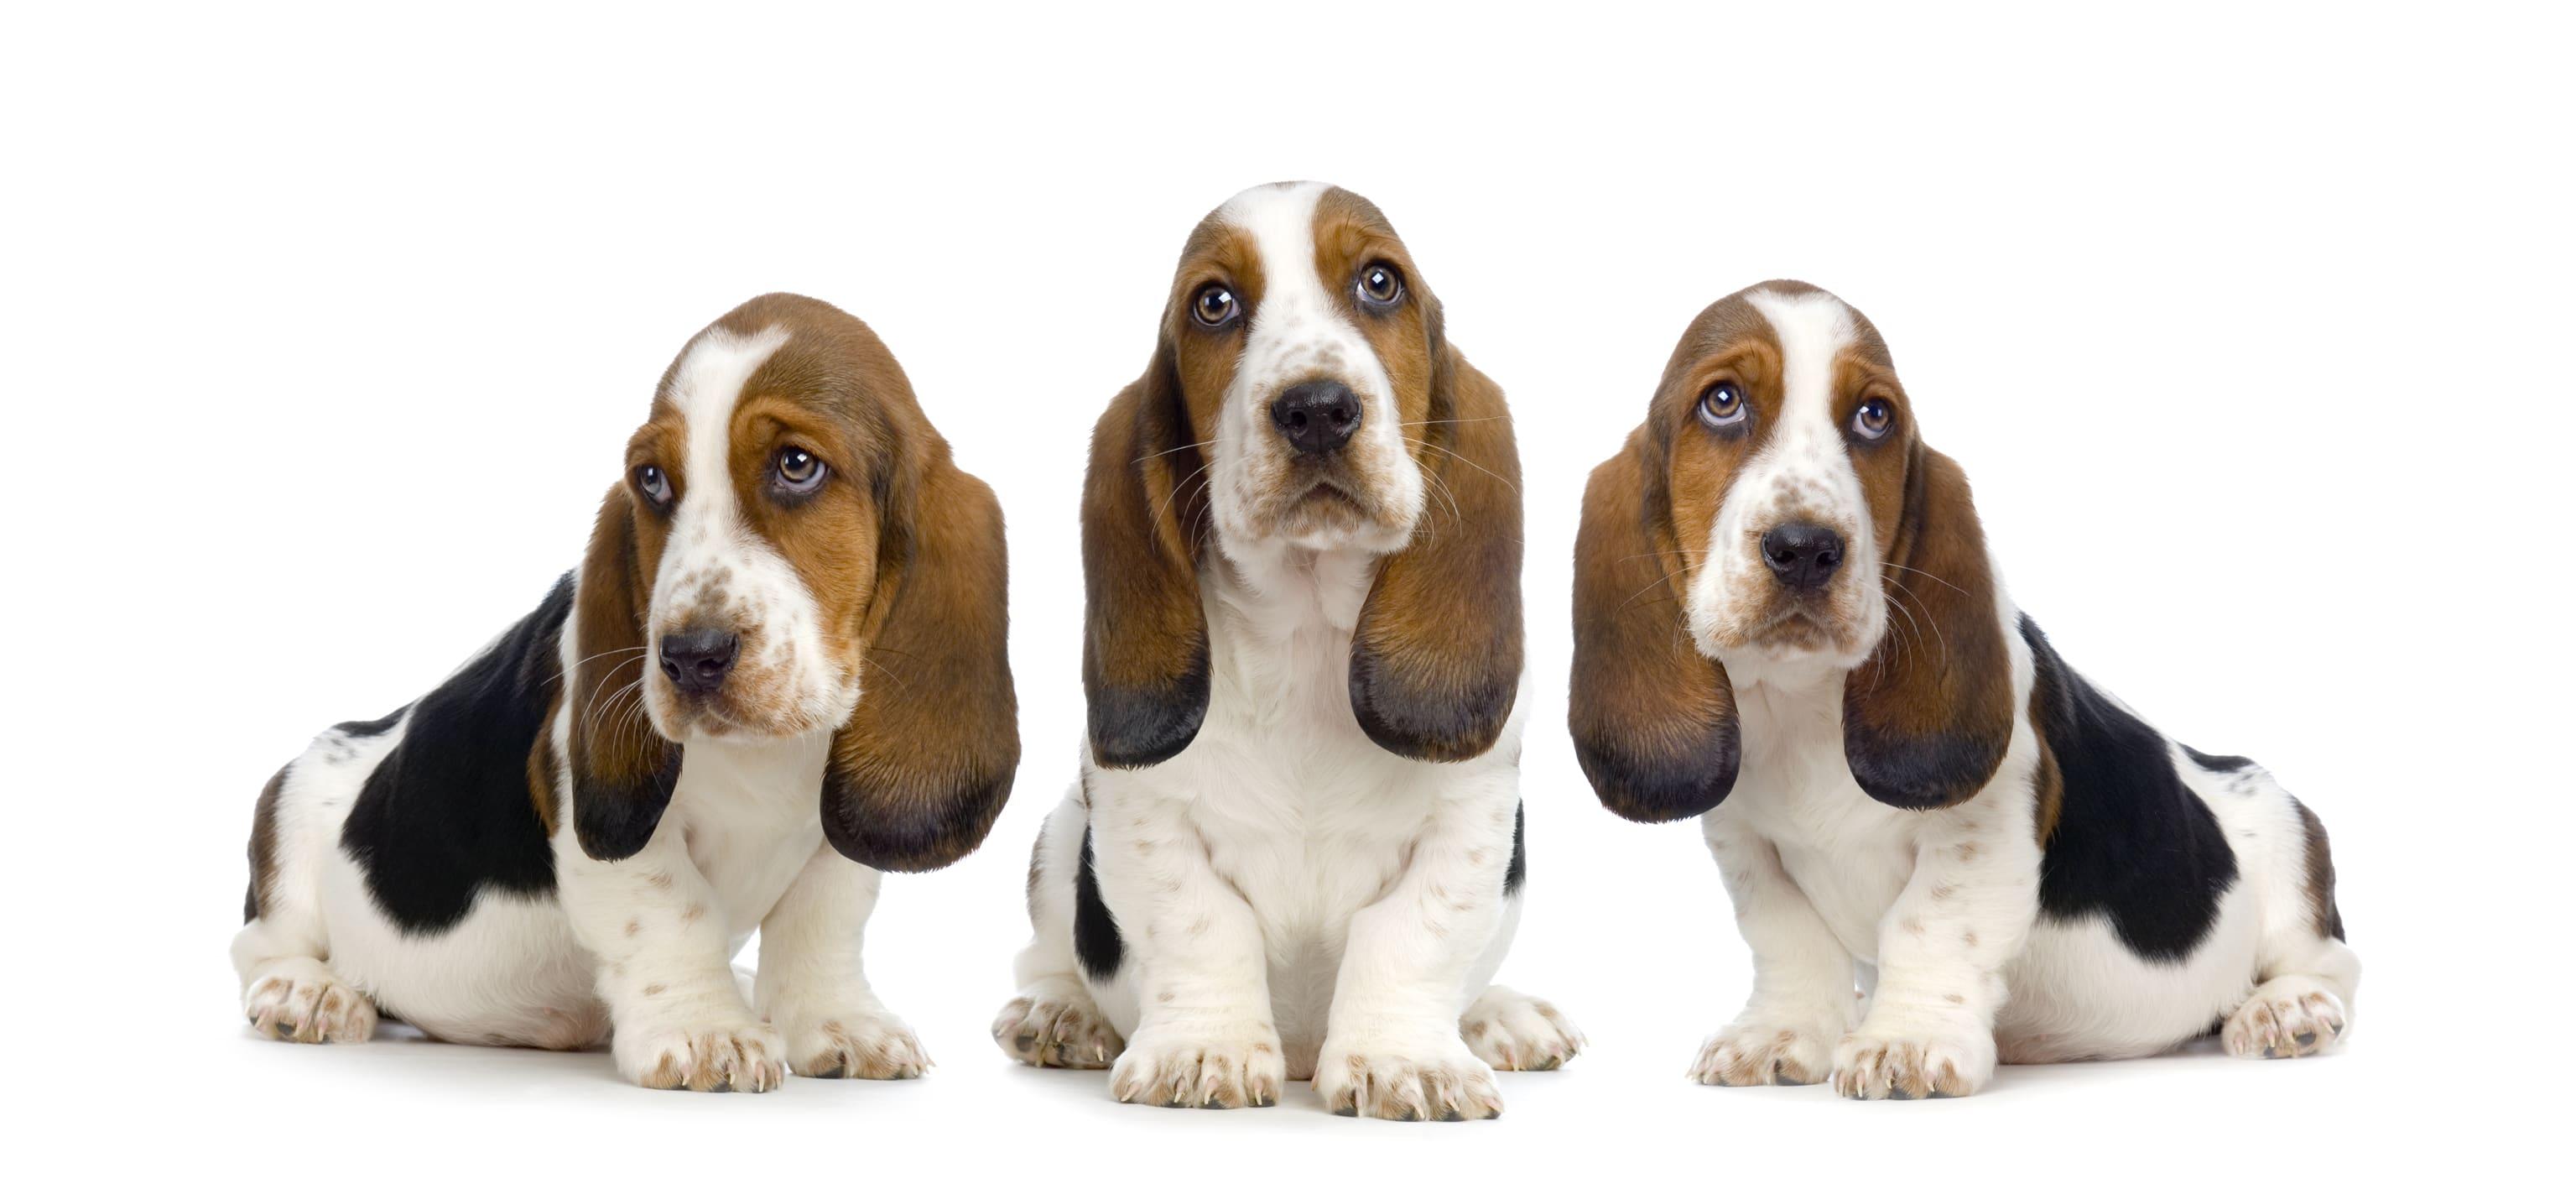 HUFF 'S HOUNDS - AKC Basset Hound Puppies